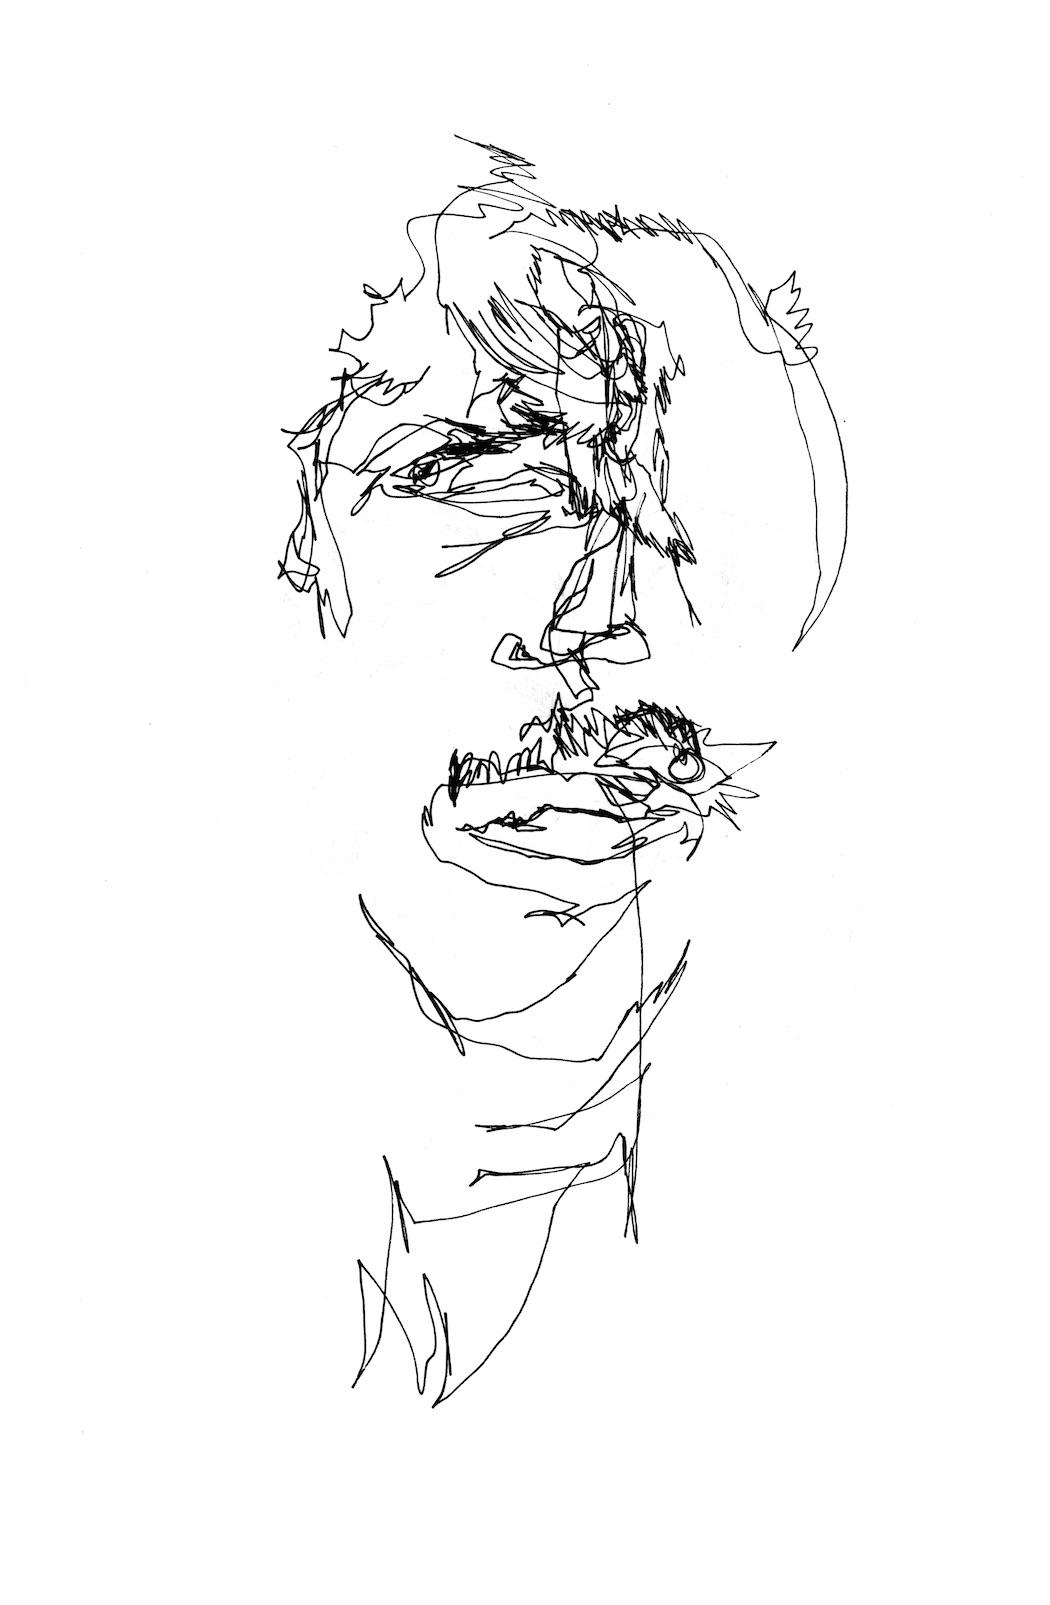 ZG Tomaszewski, illustrated by Hayley Hungerford